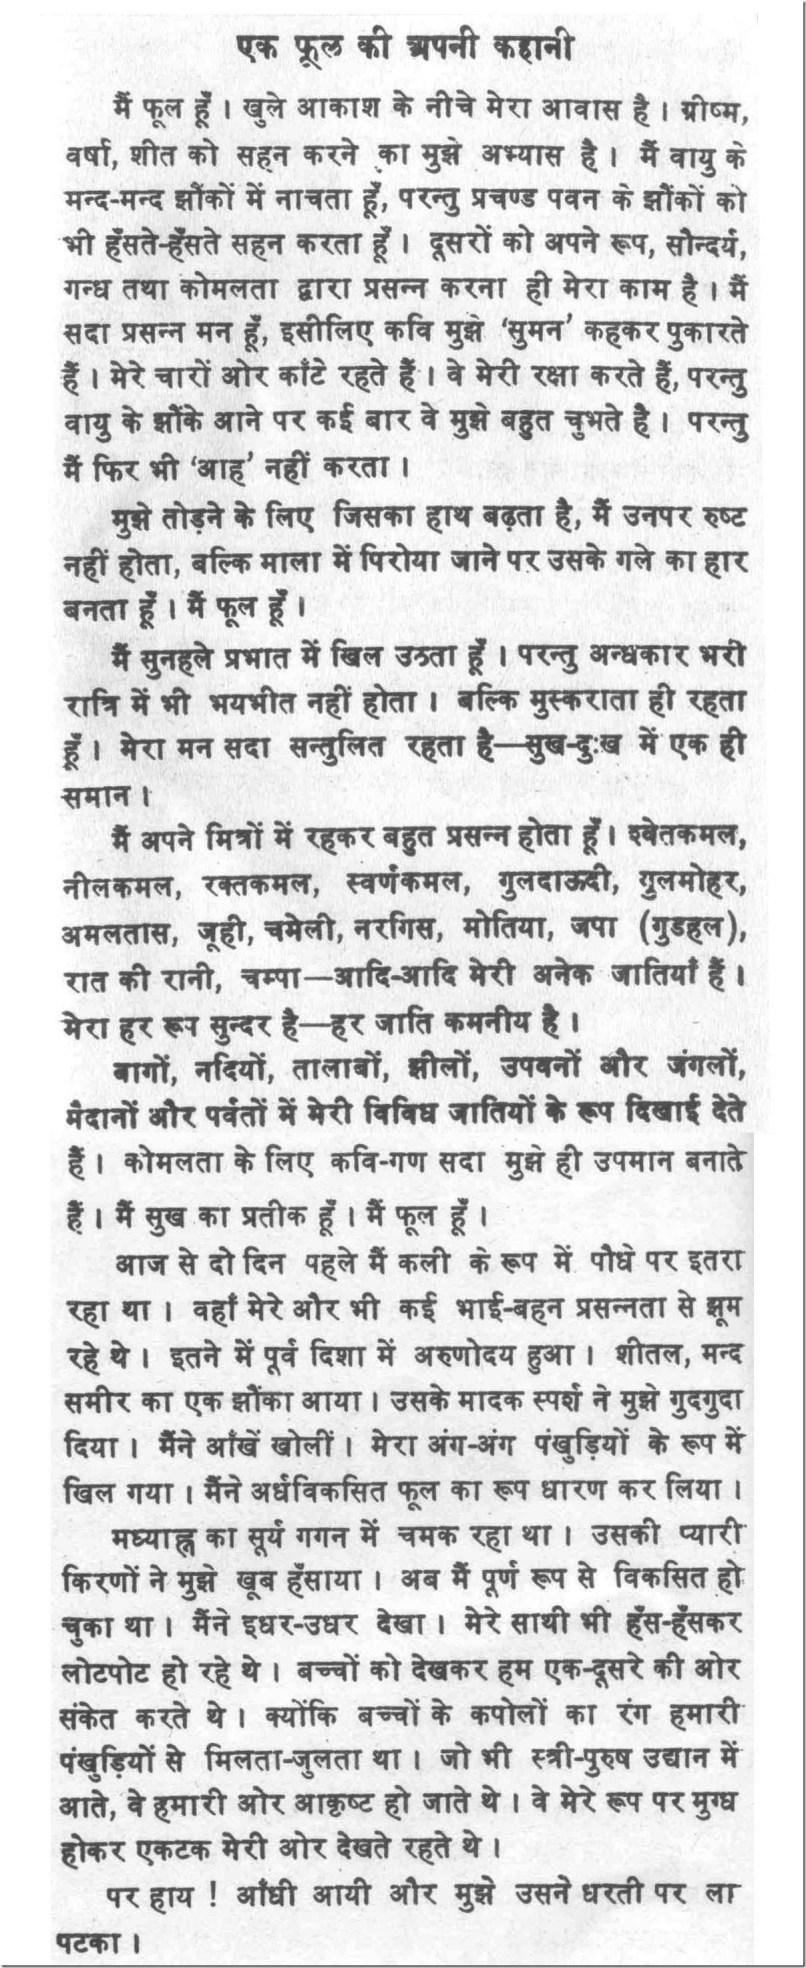 017 About Rose Flower Essay Example 100030 Thumbresize8062c1968 Unbelievable In Marathi Kannada Language Full